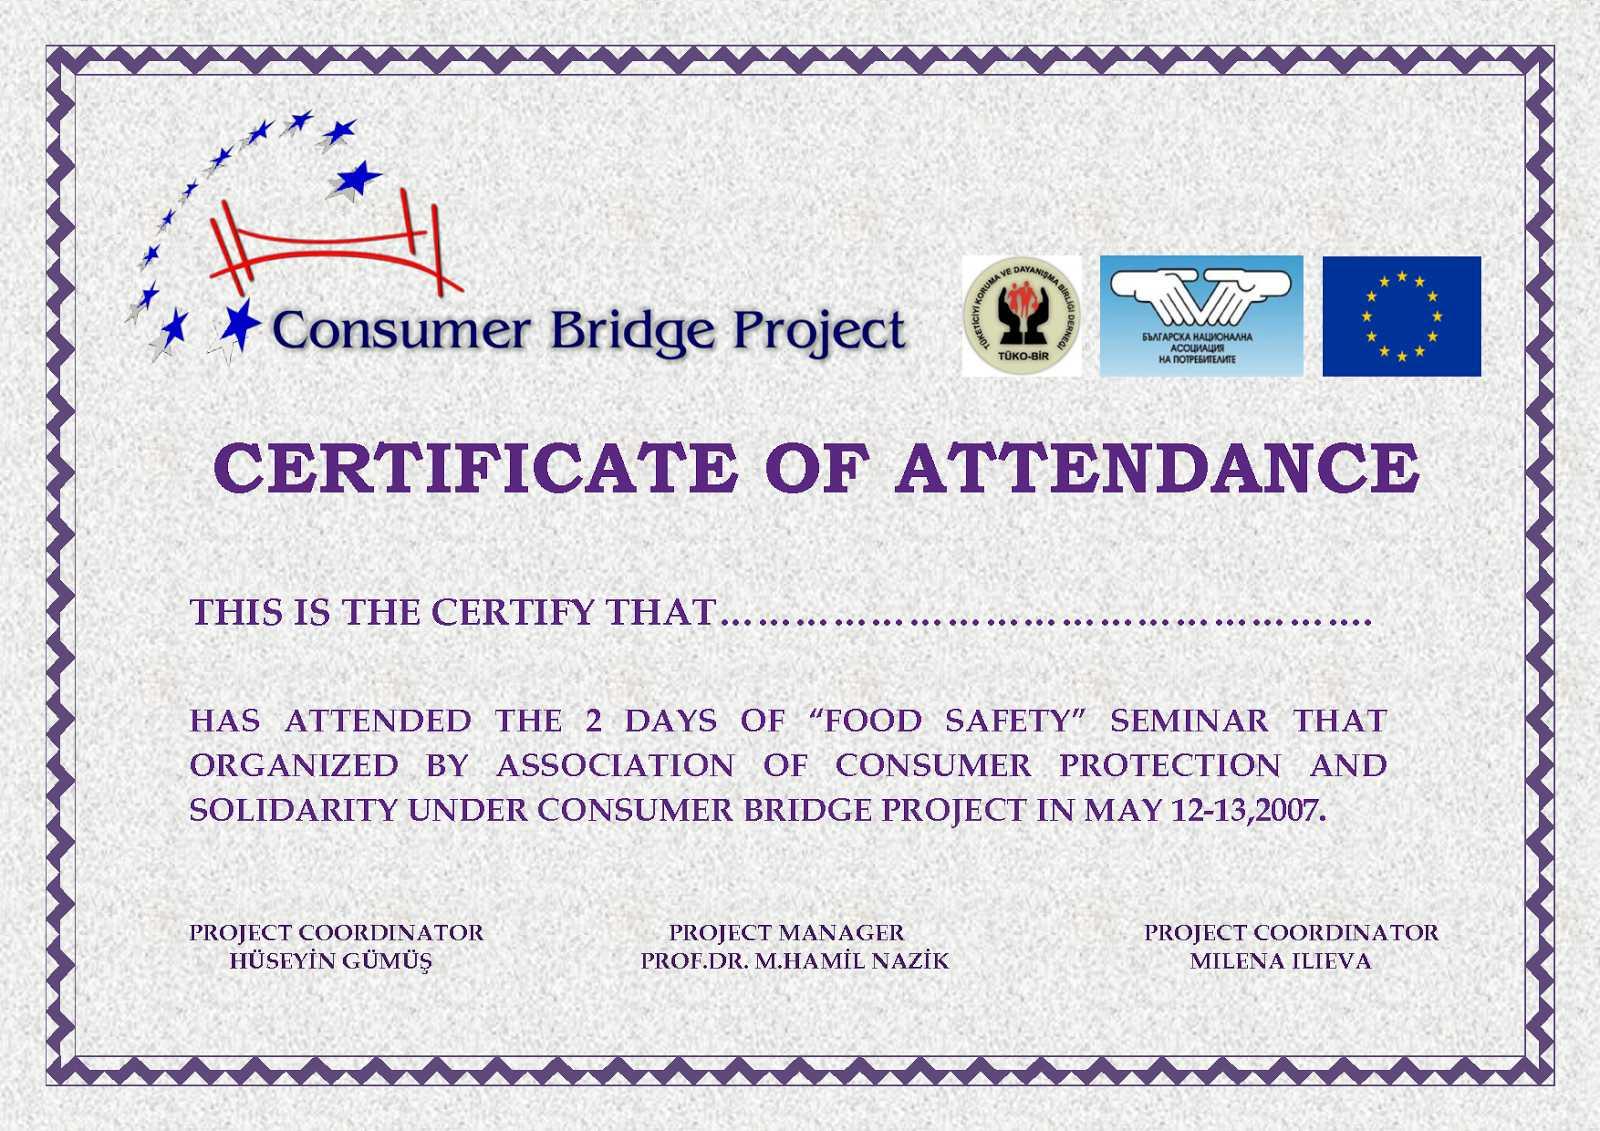 Attendance Certificate Template Free - Karati.ald2014 Intended For Perfect Attendance Certificate Free Template